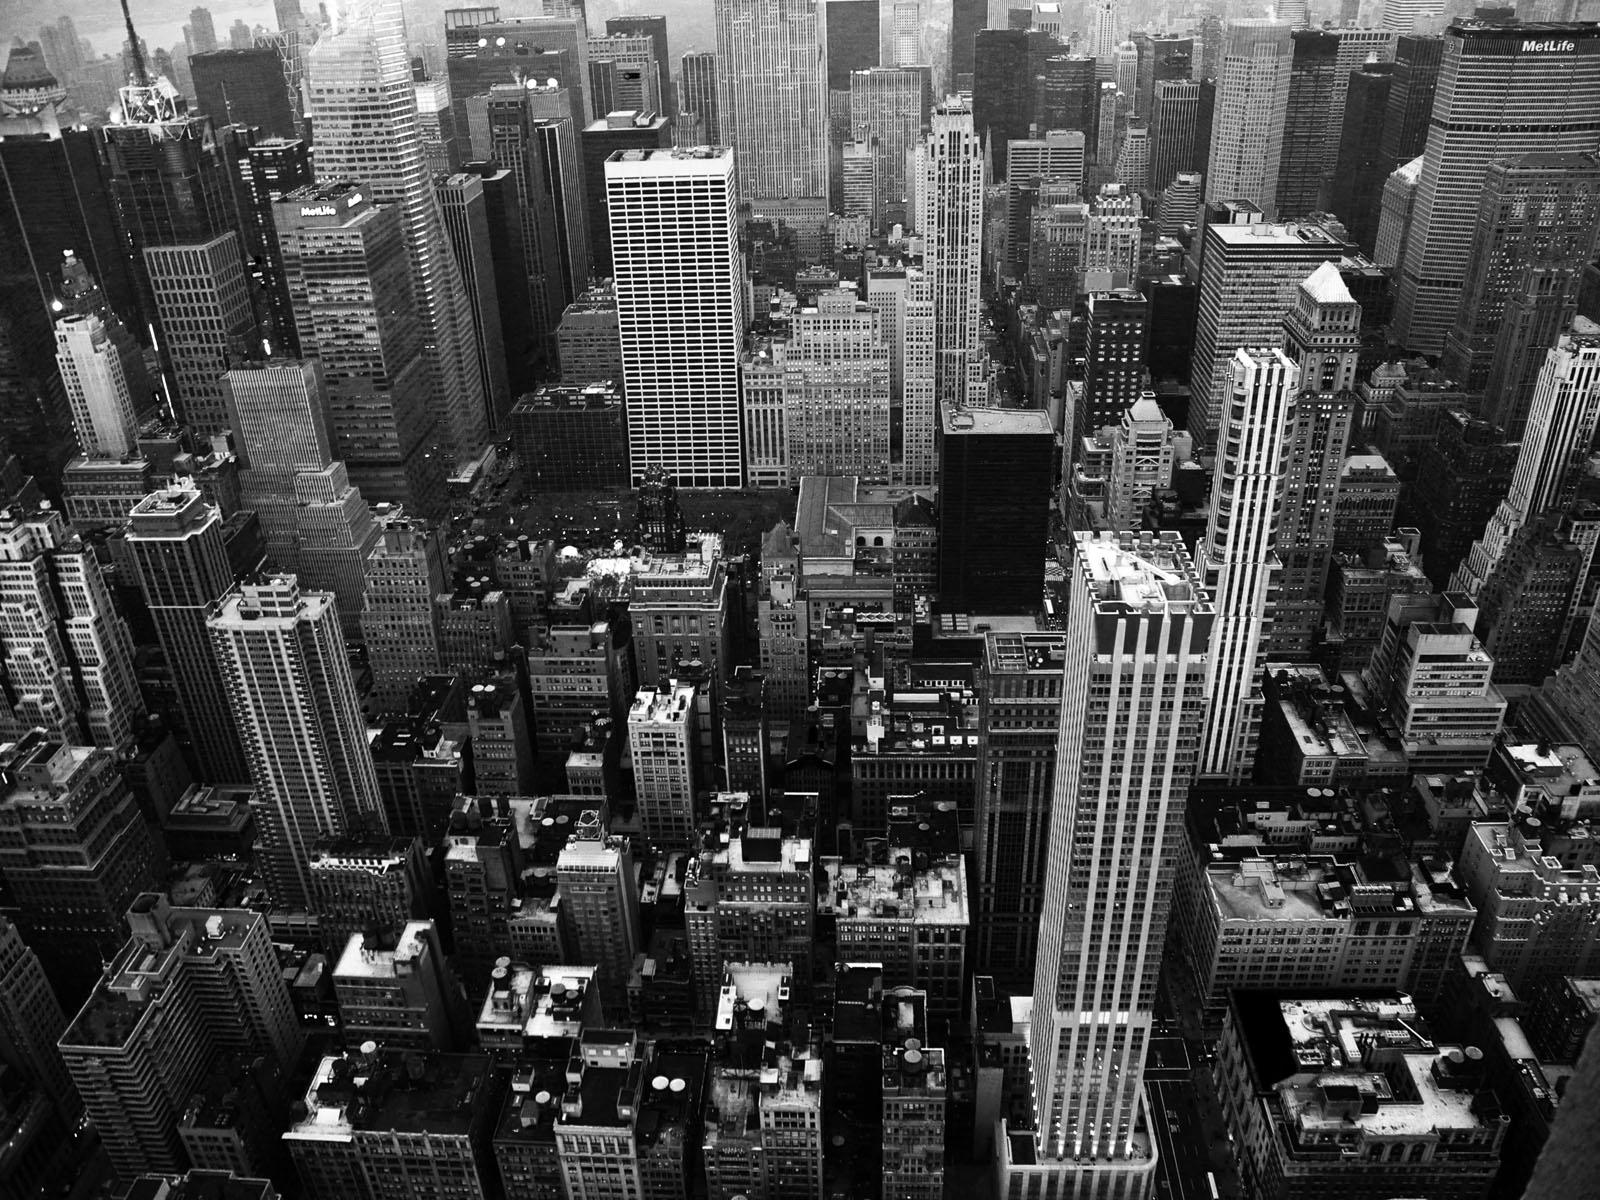 NYC Black and White Wallpaper - WallpaperSafari